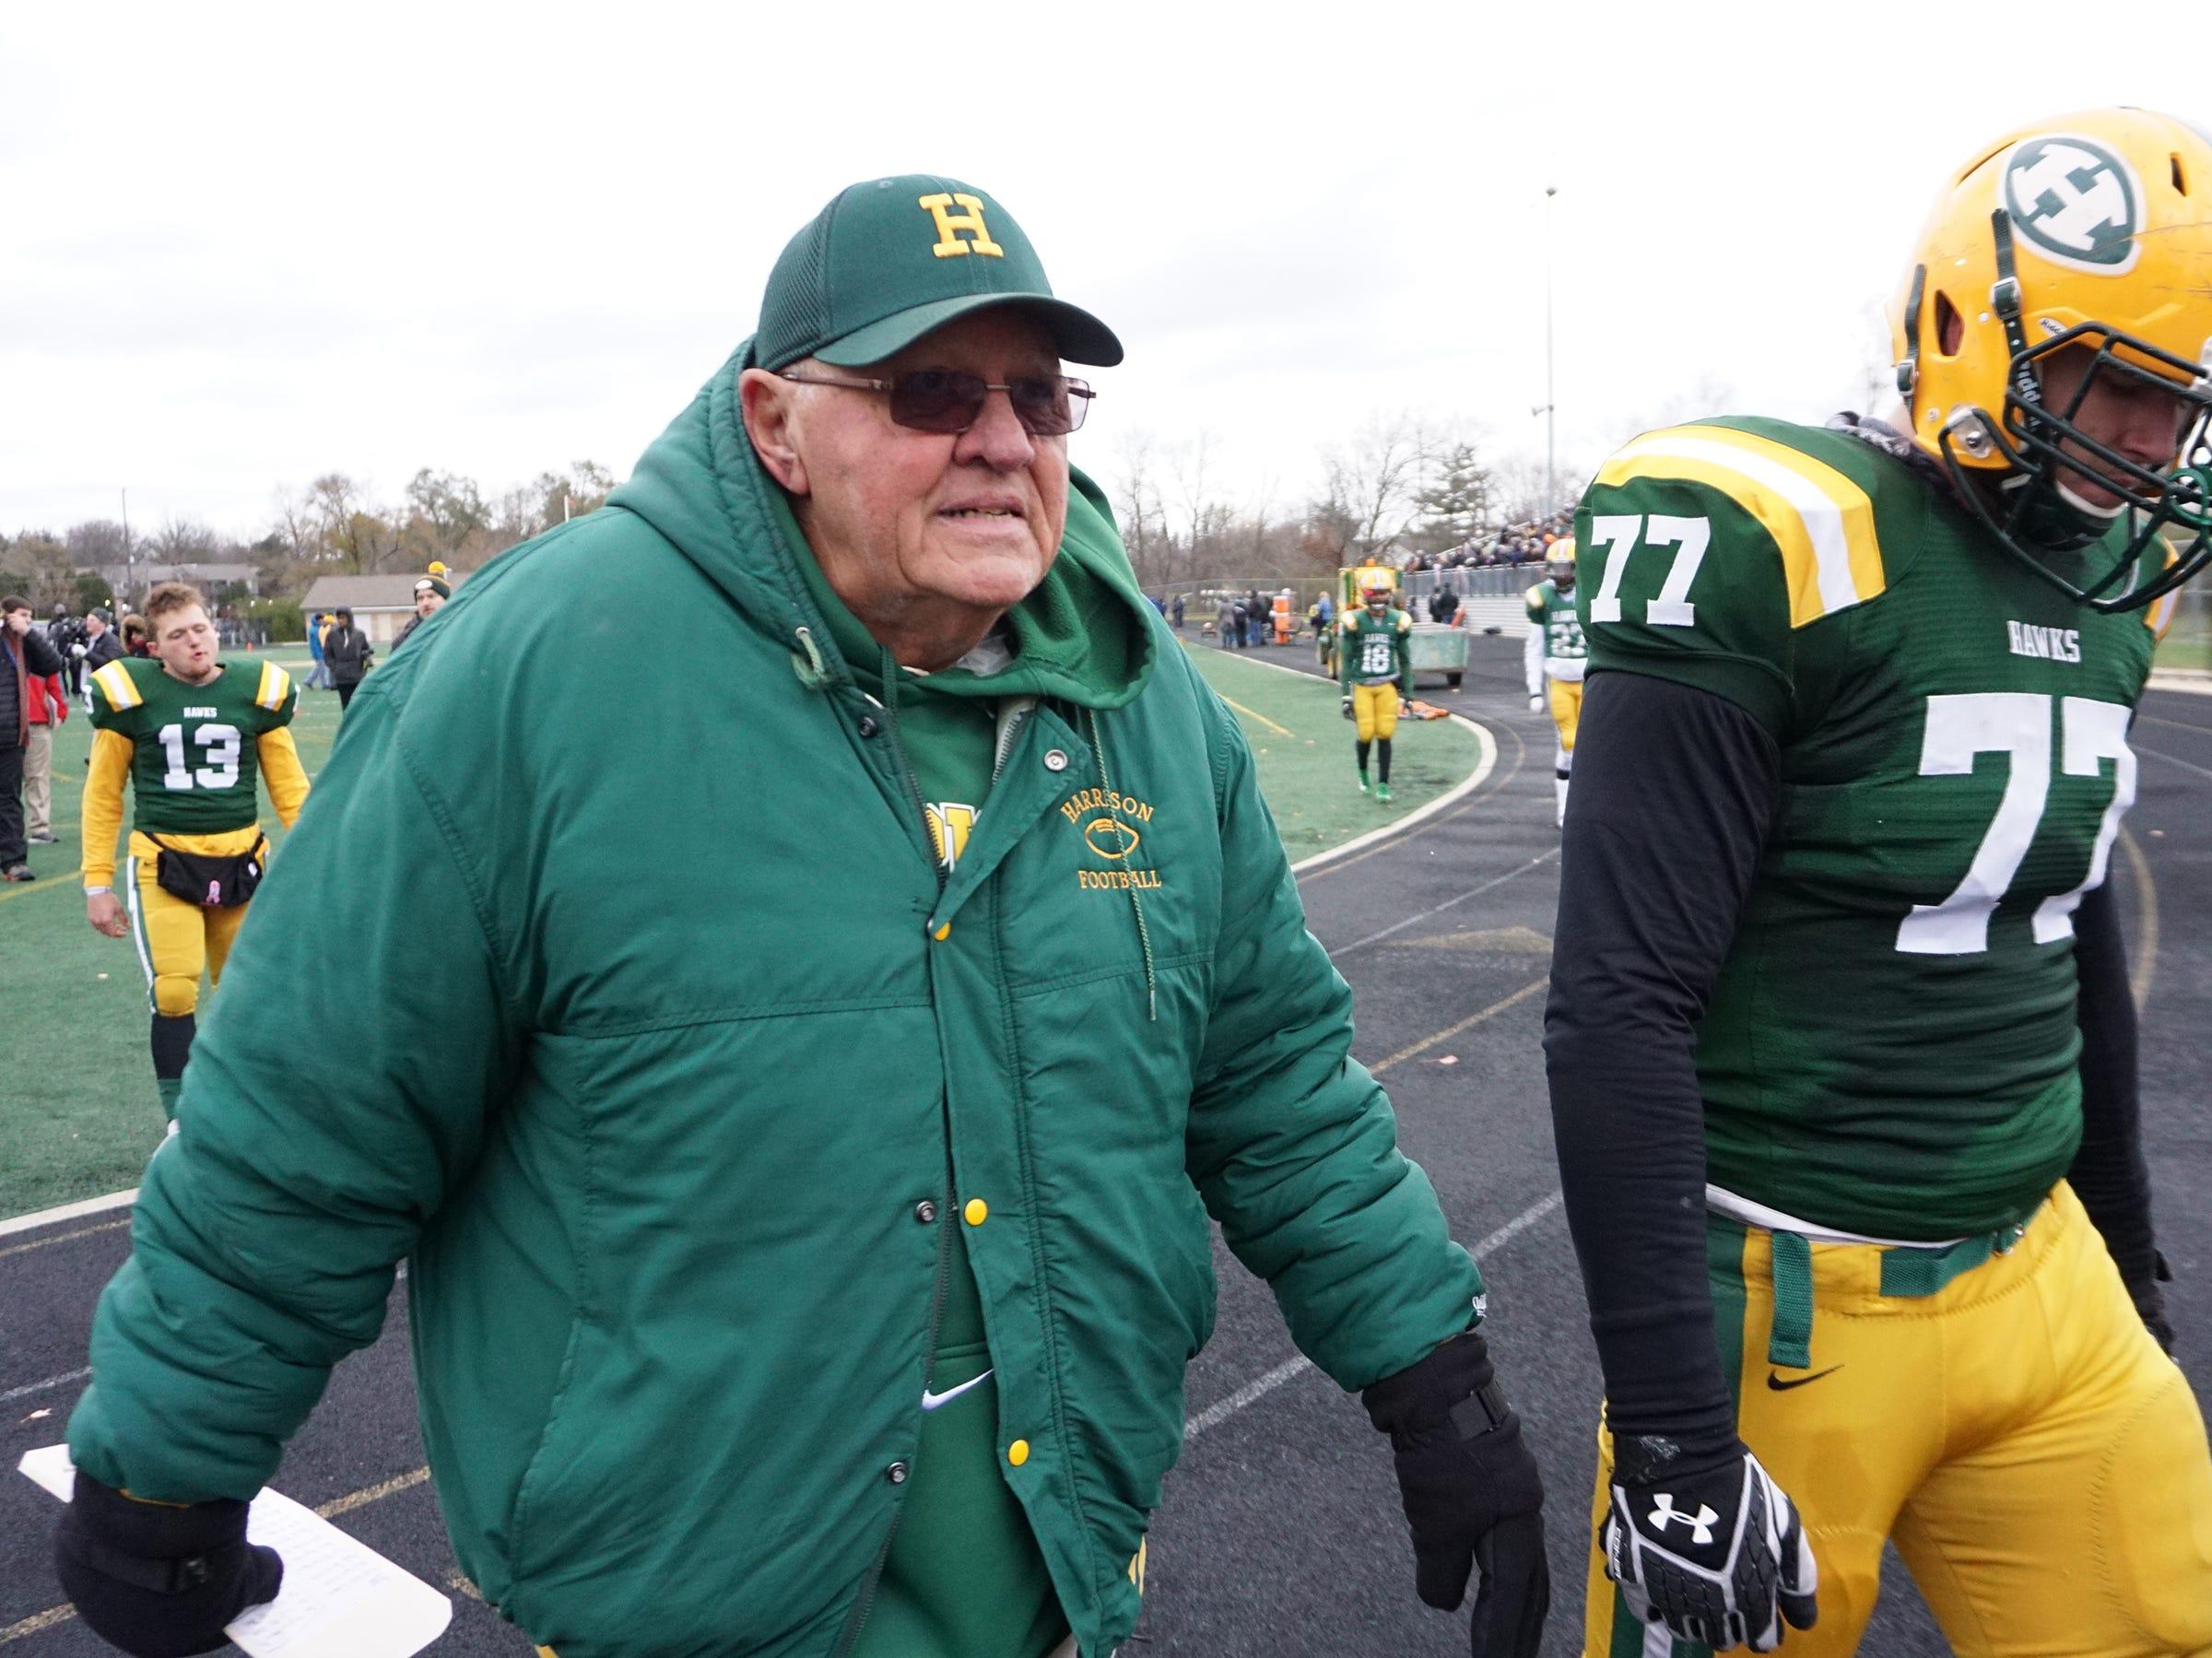 Farmington Harrison loses 21-14 ending the storied football program